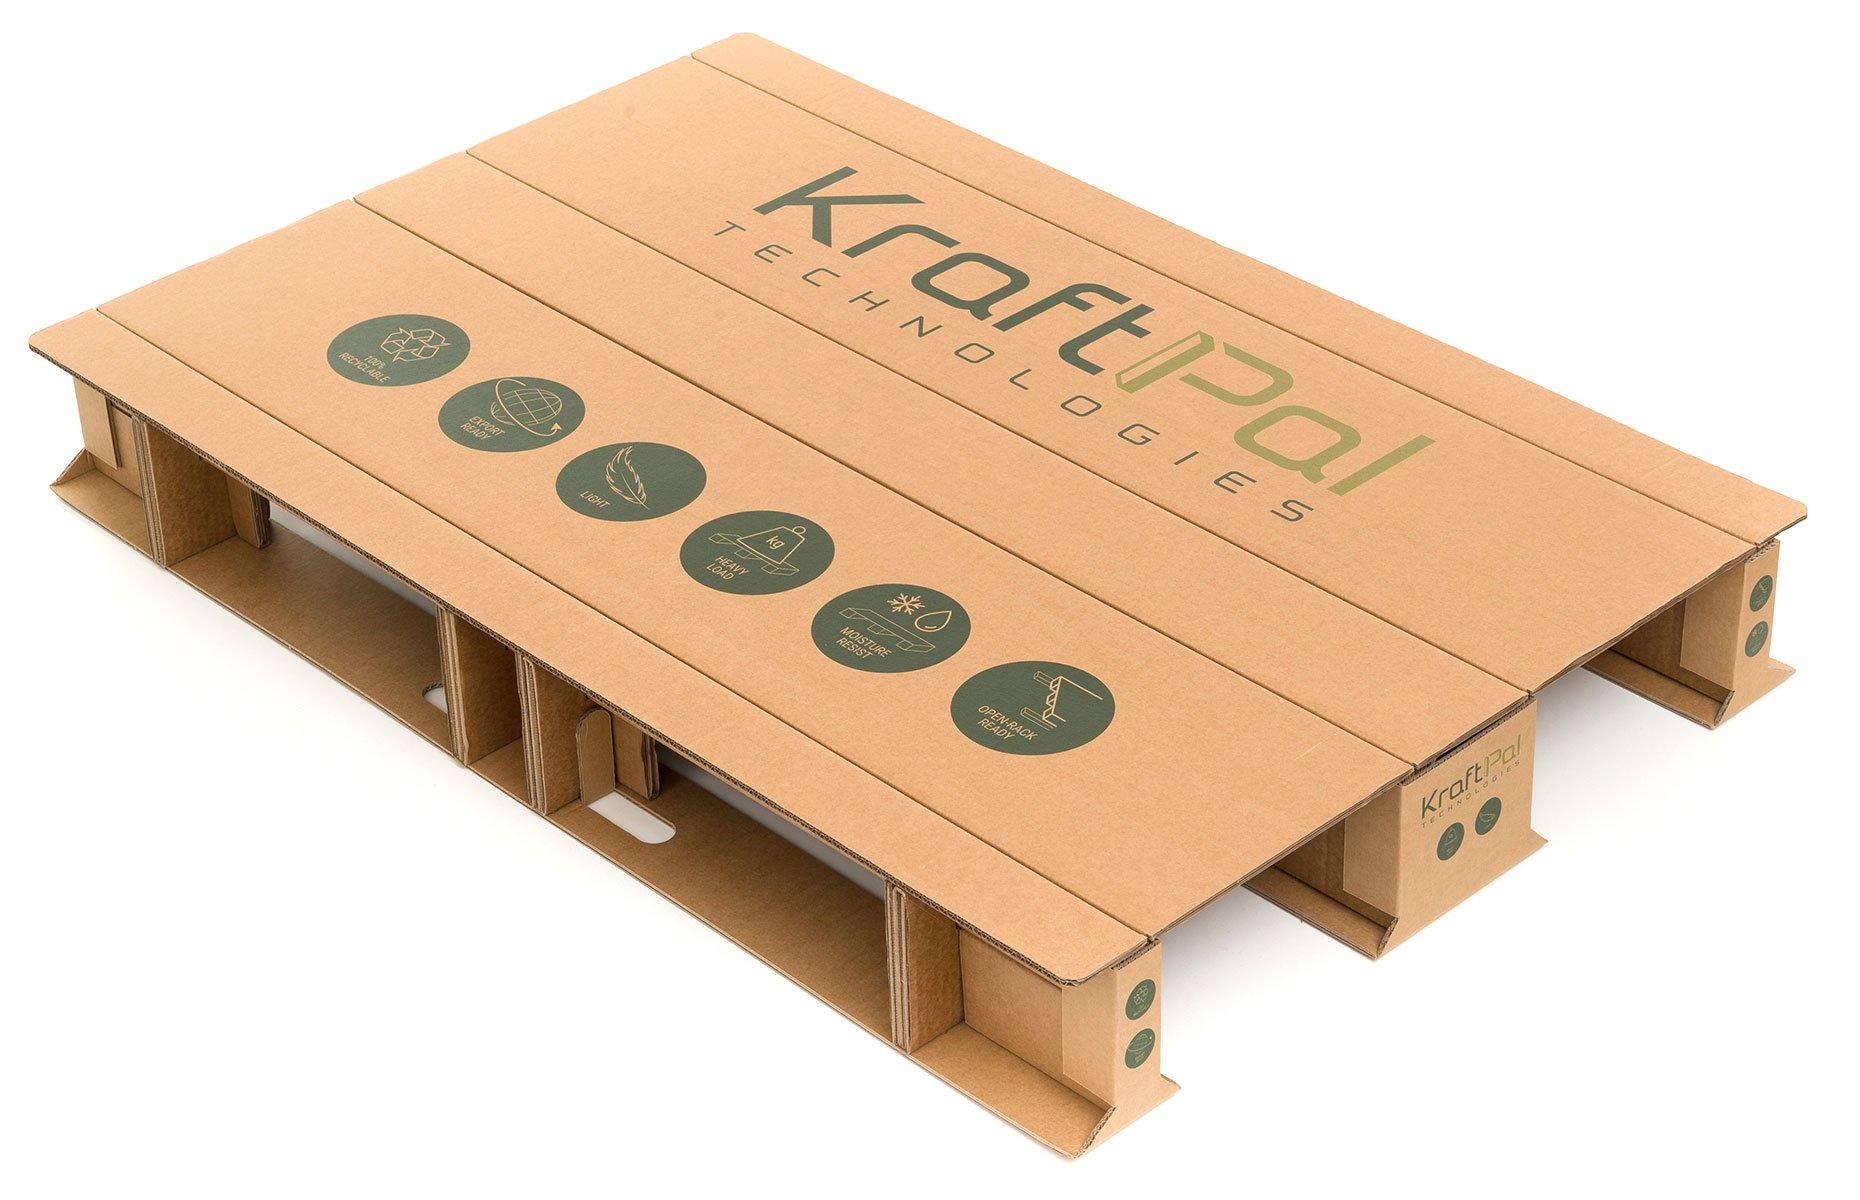 KraftPal-X-Pallet-HD-1.jpg